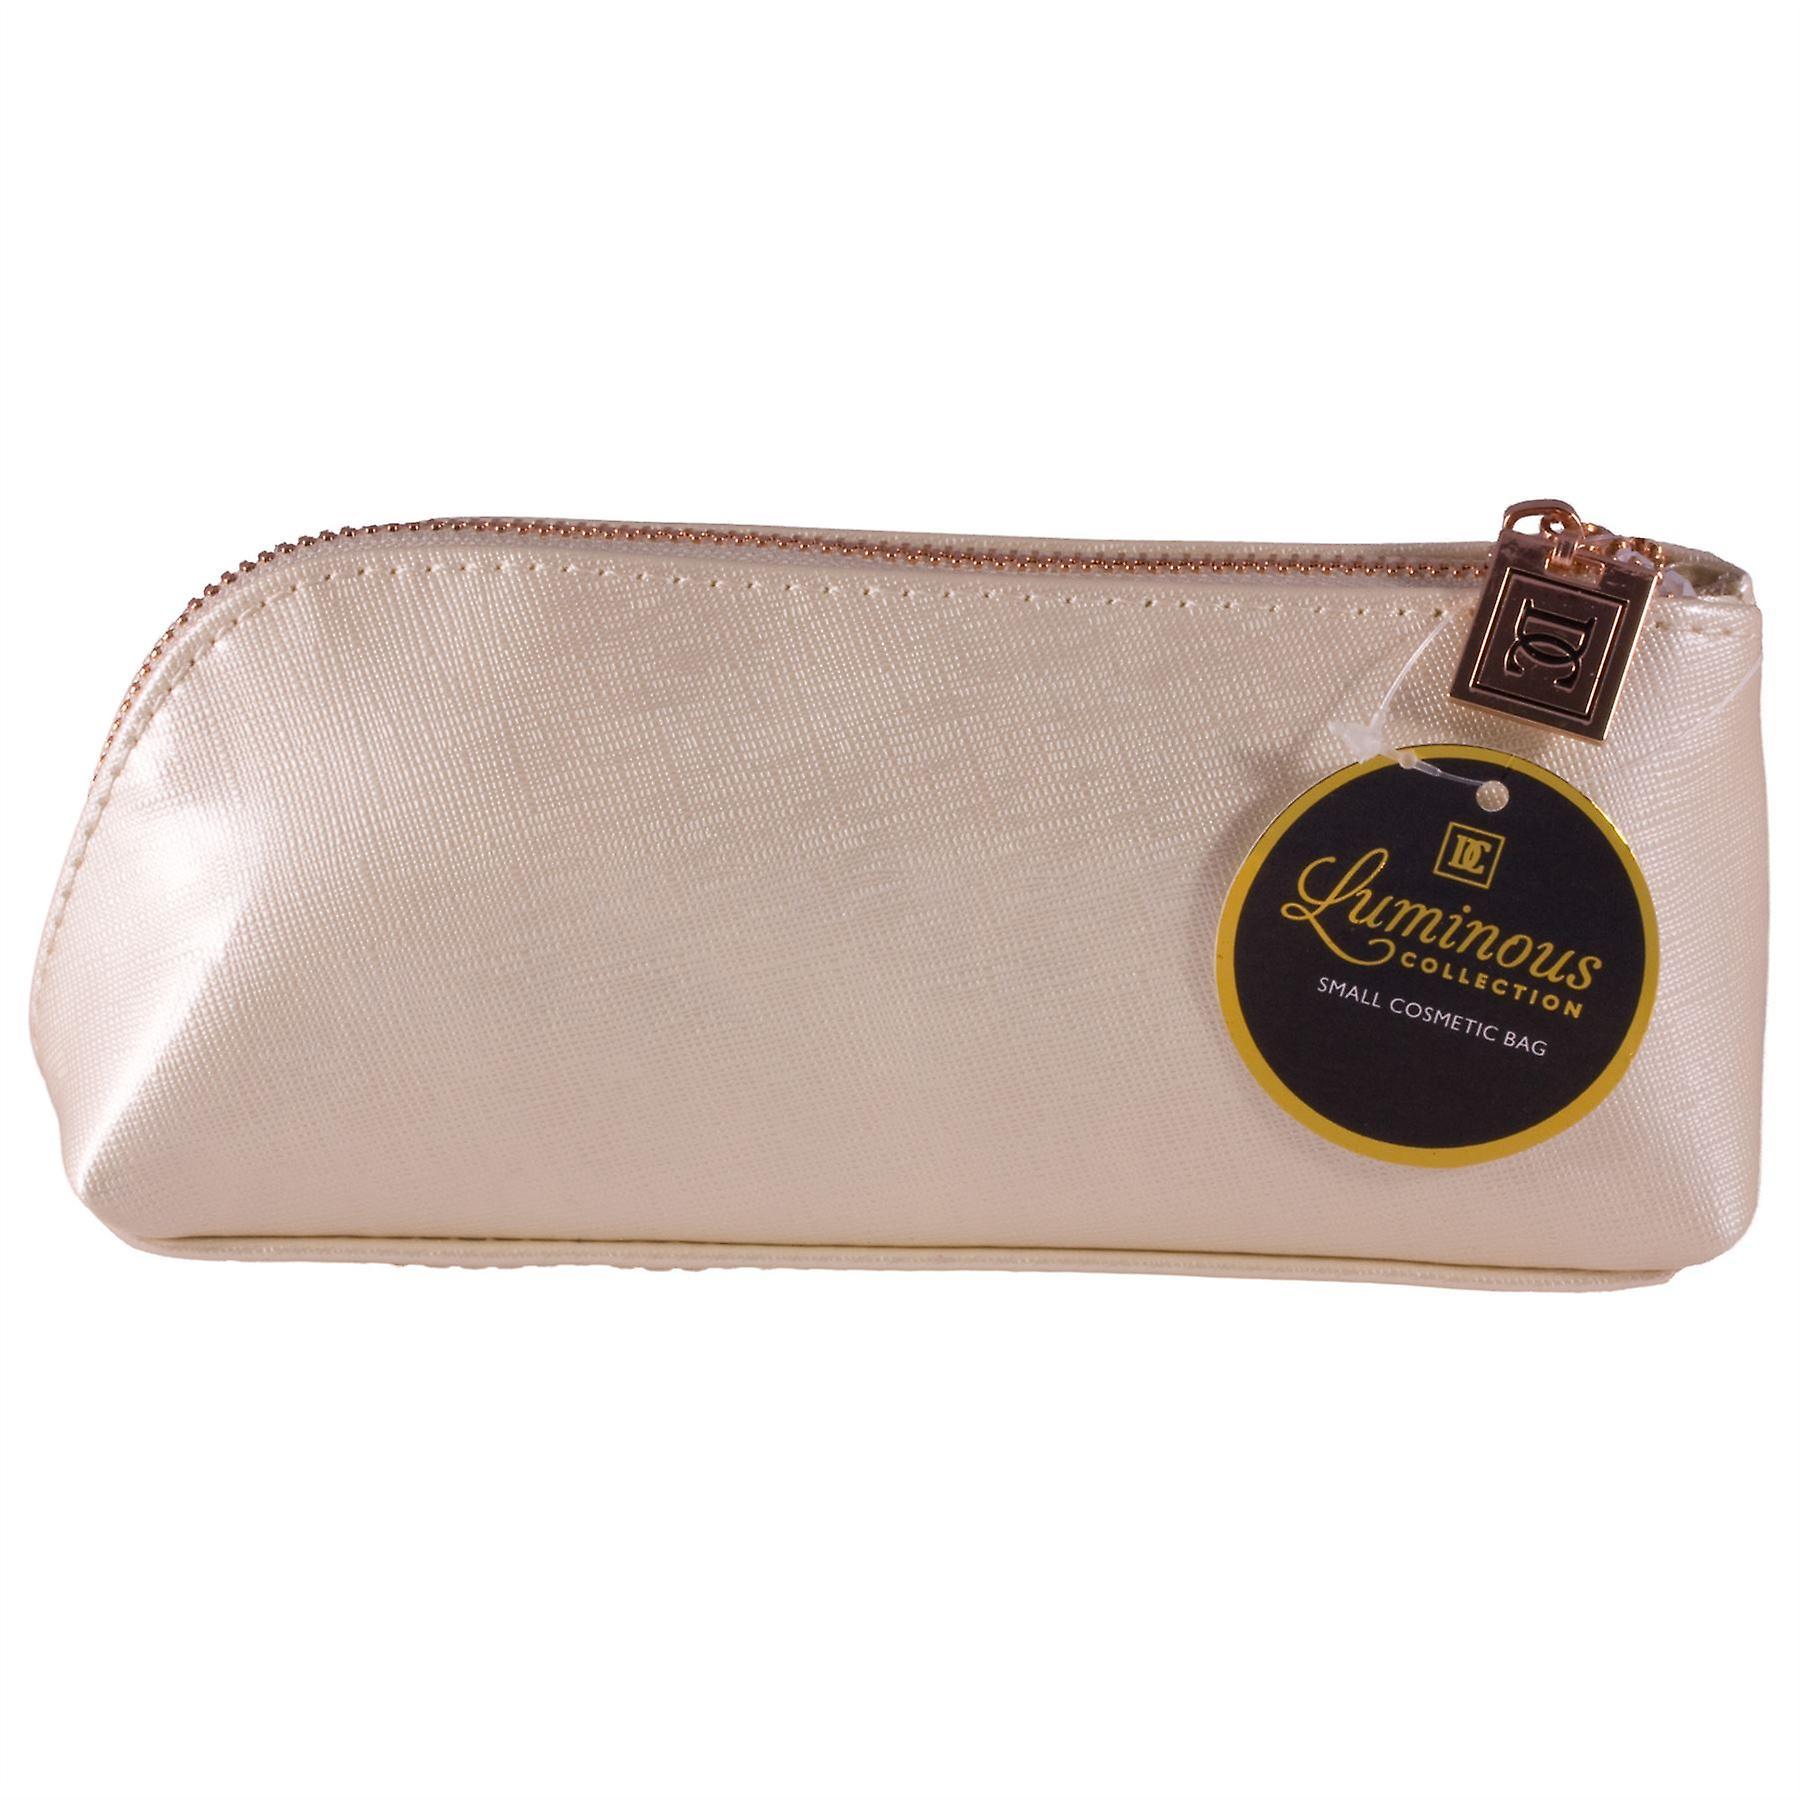 Danielle Creations Luminous Collection Small Pencil Case Makeup Bag - Cream